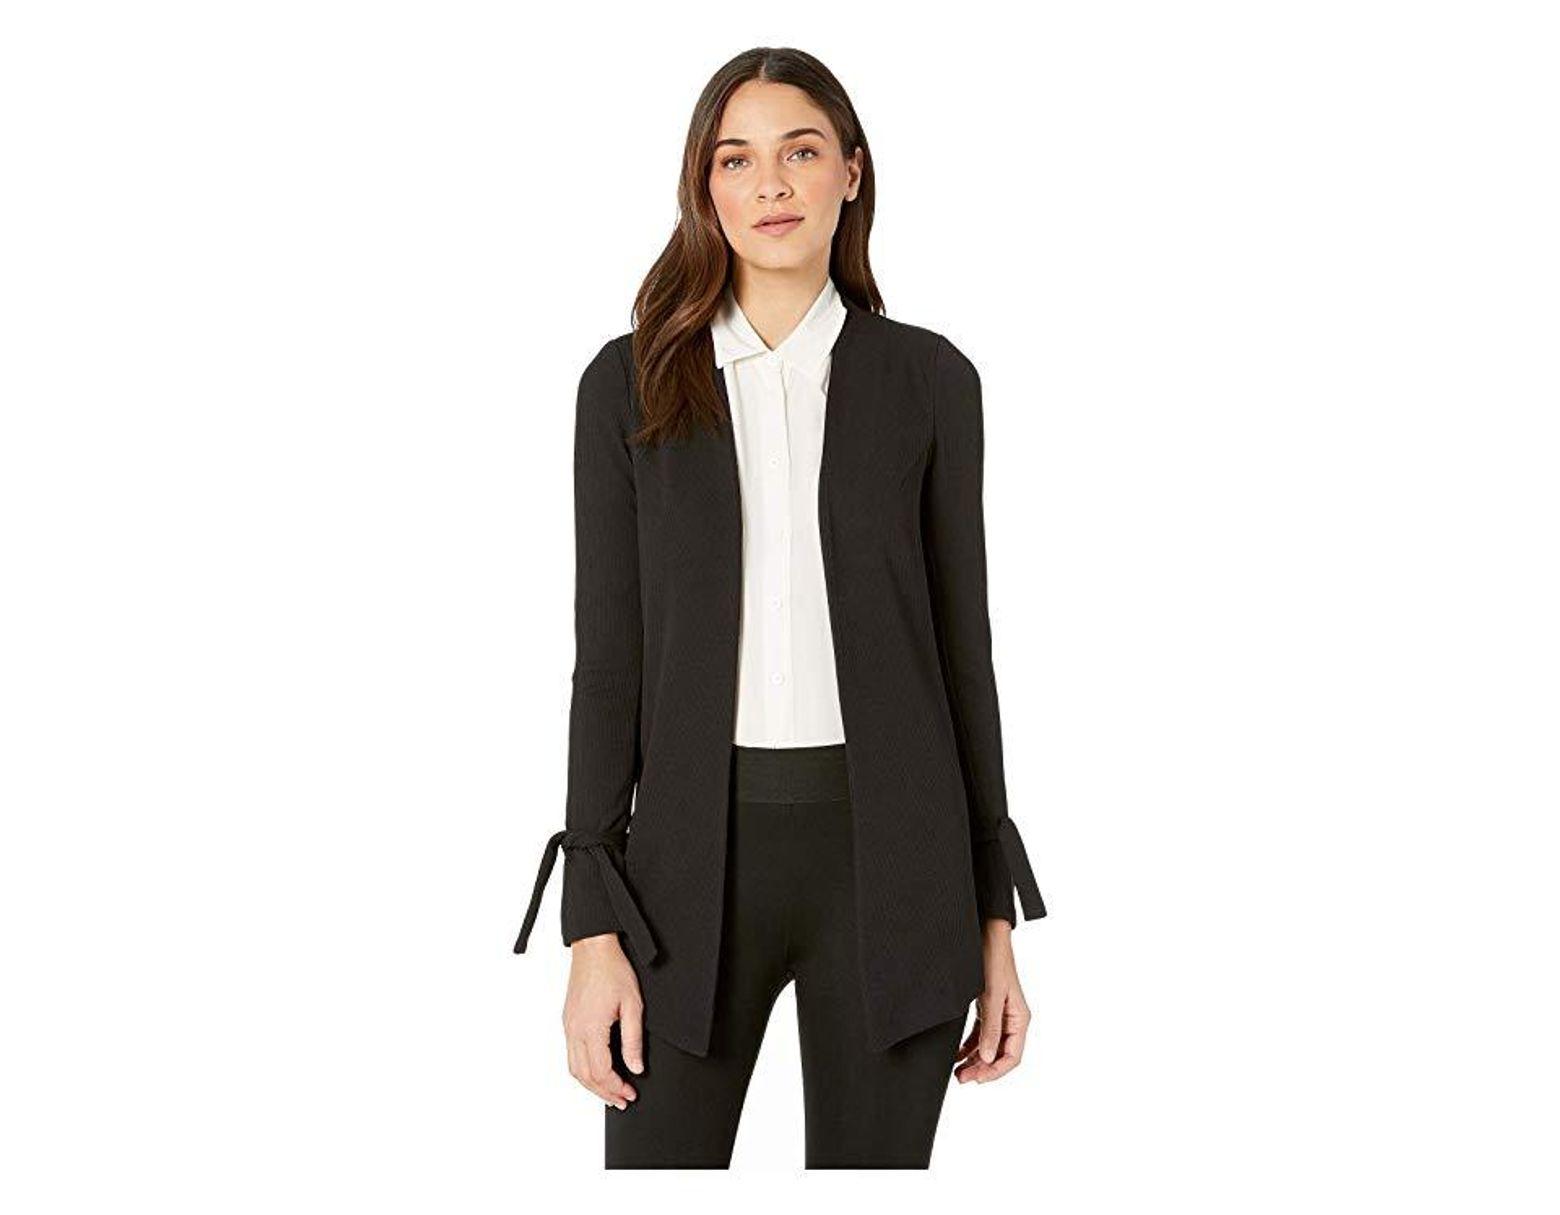 fa583bb523b BCBGeneration Tuxedo Knit Long Blazer Jacket (black) Clothing in Black -  Save 44% - Lyst